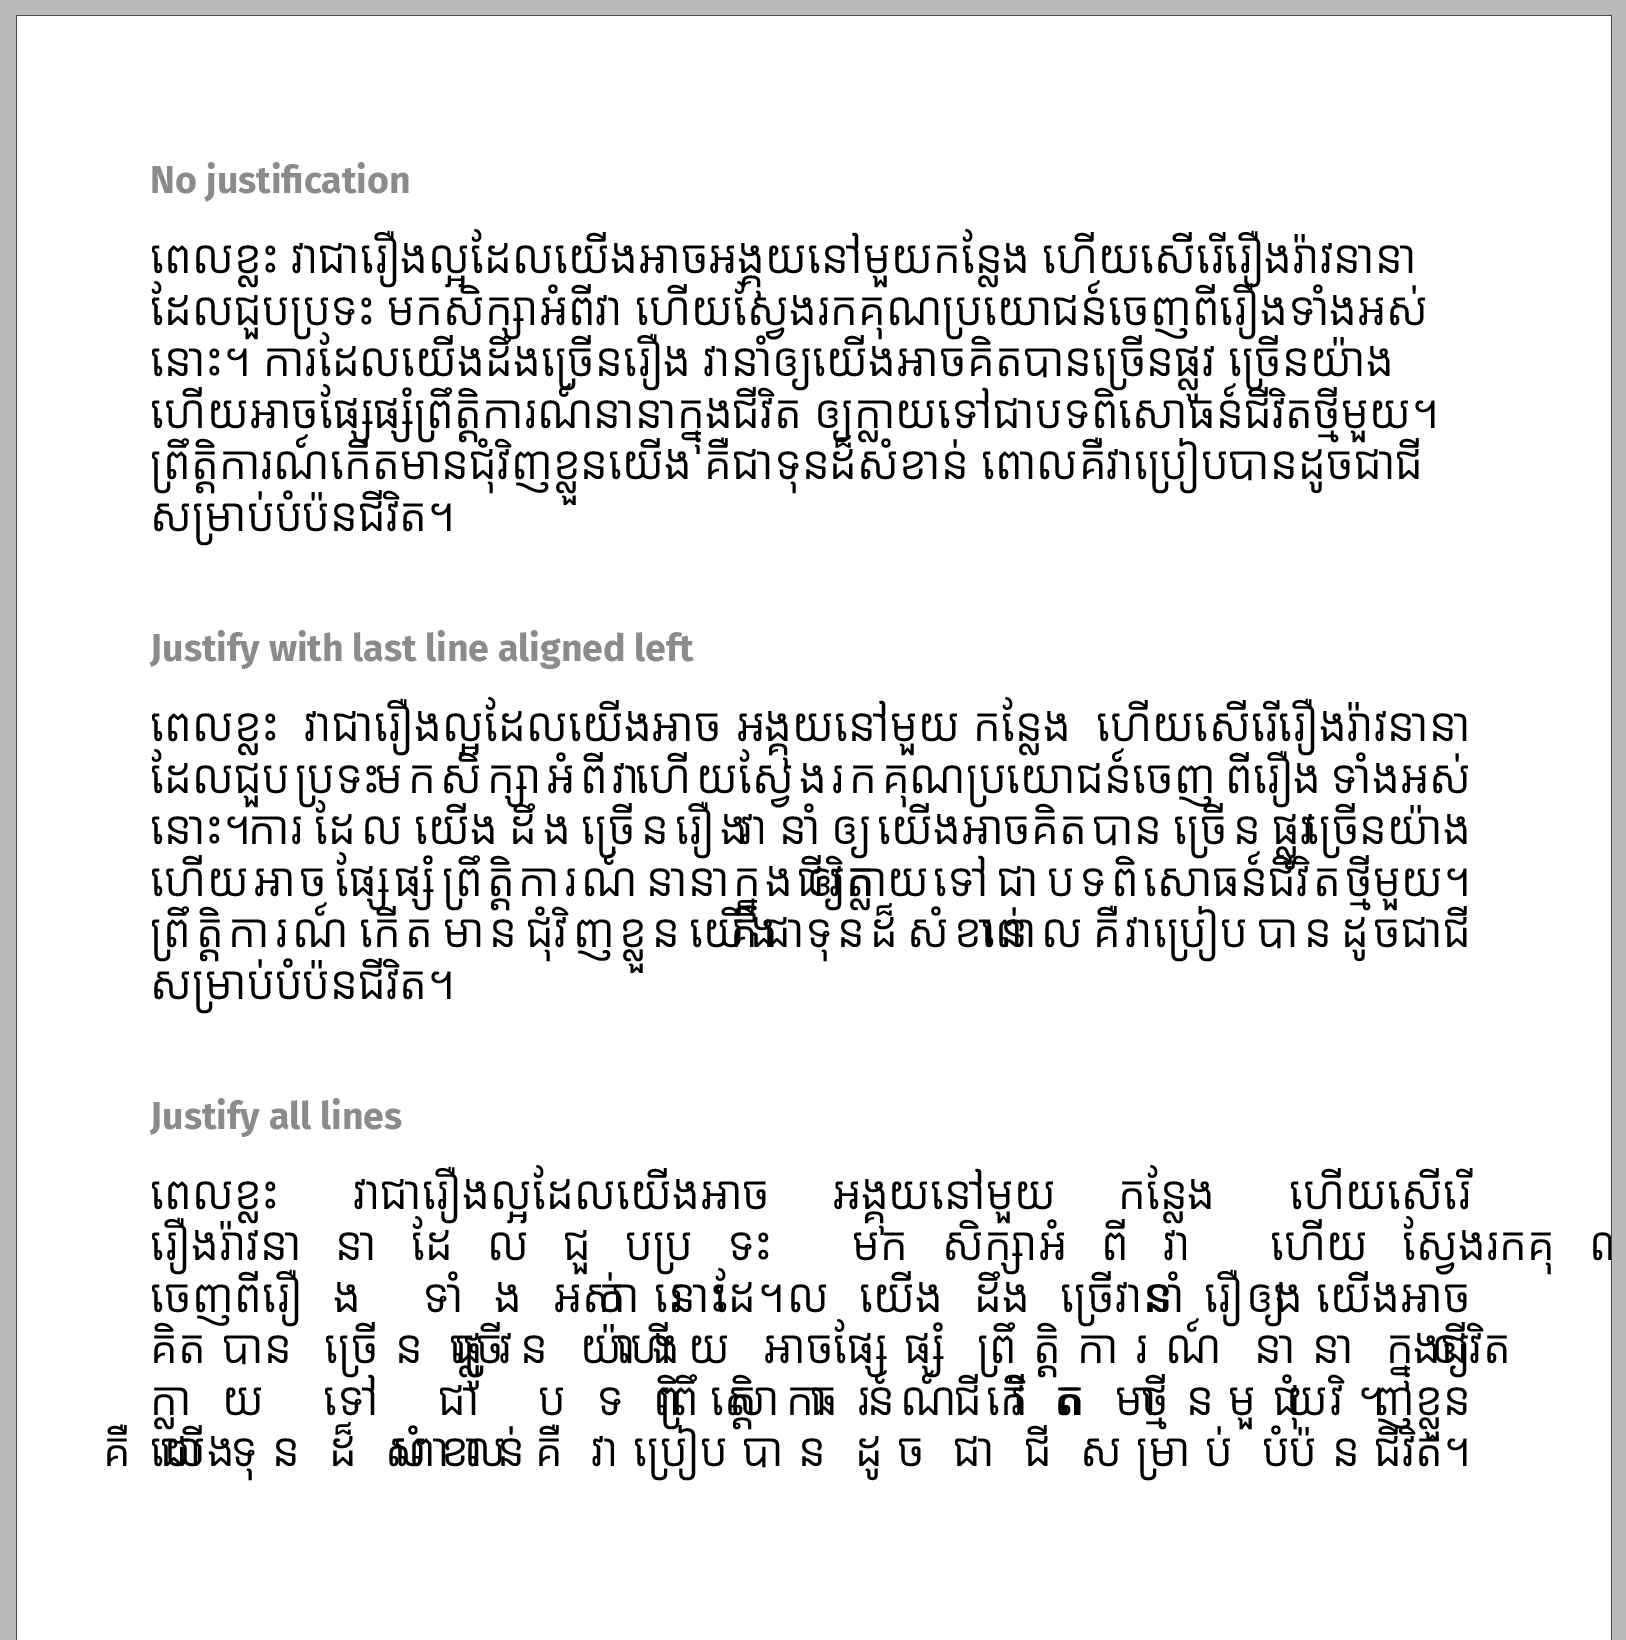 Khmer script justification is broken in Adobe InDesign